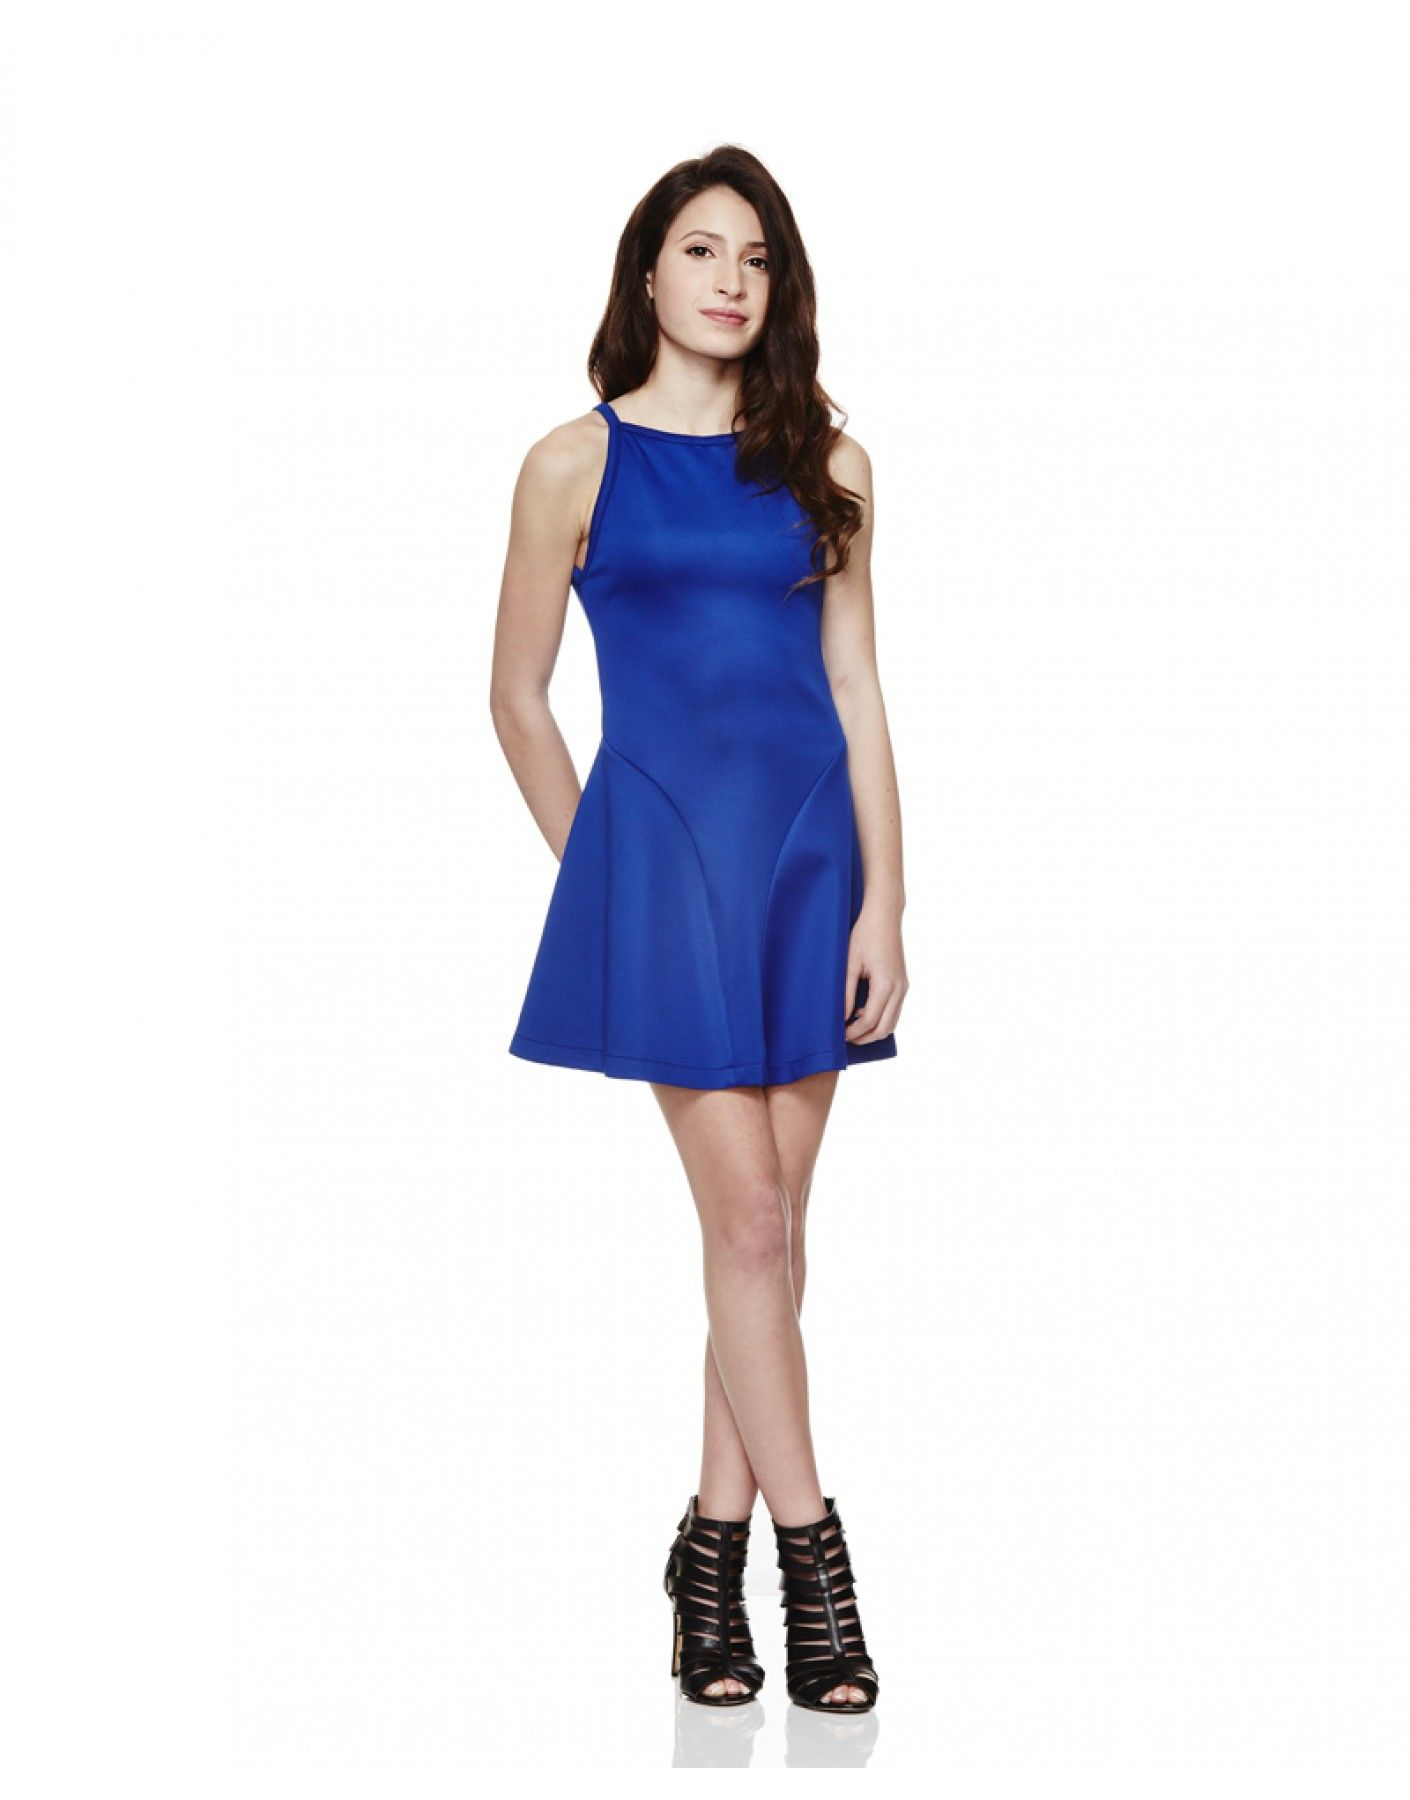 Tween Skater Dresses